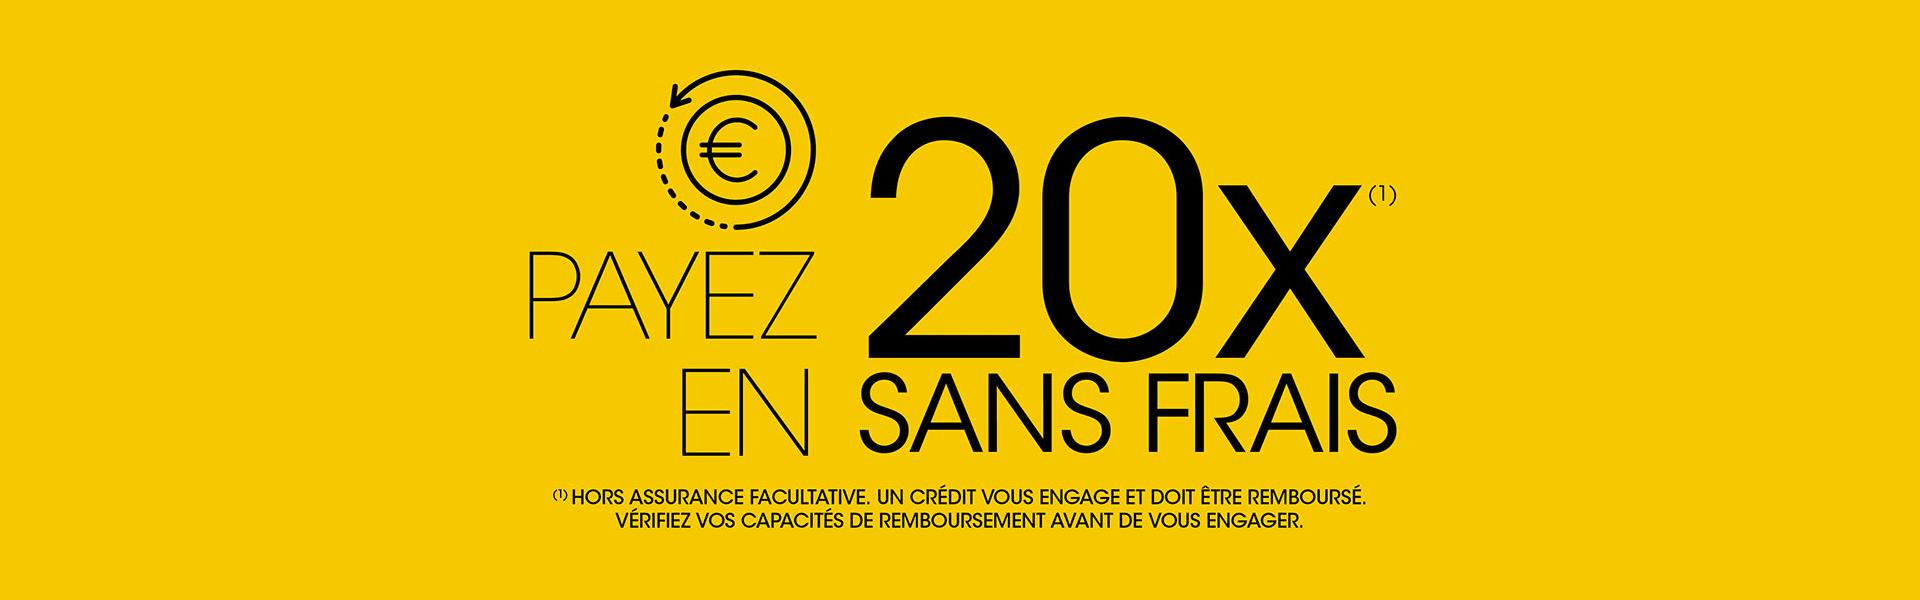 ATL107_20x_sans_frais_ban_web_1920x600